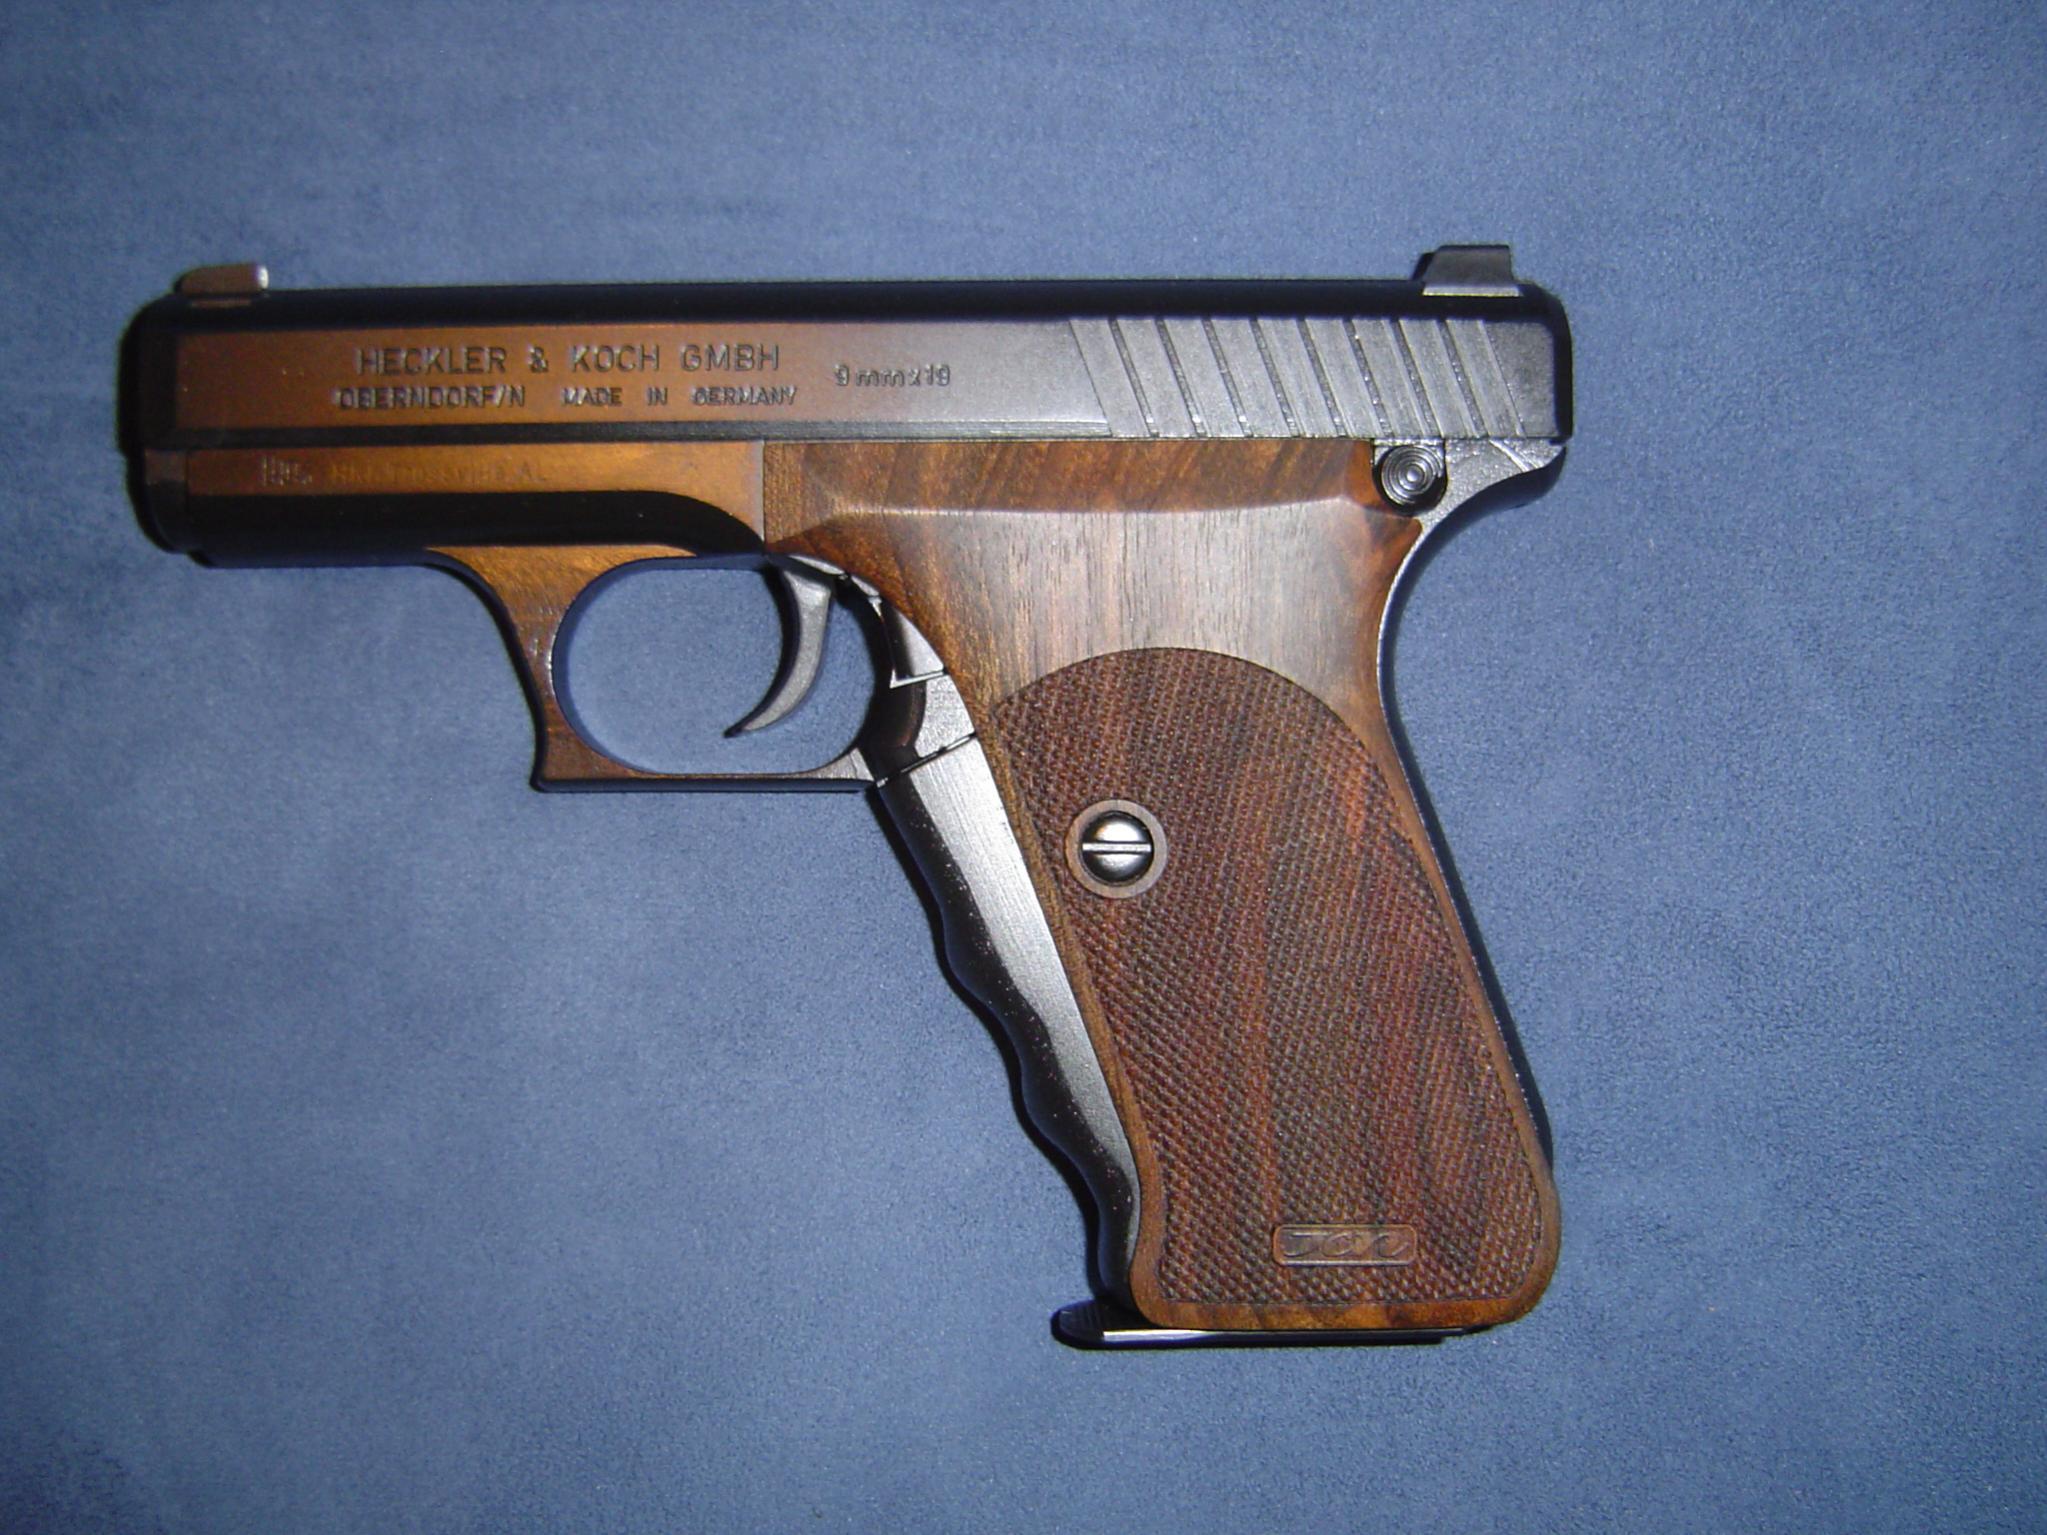 Here is my new carry gun... HK P7 PSP-hk-p7-psp.jpg